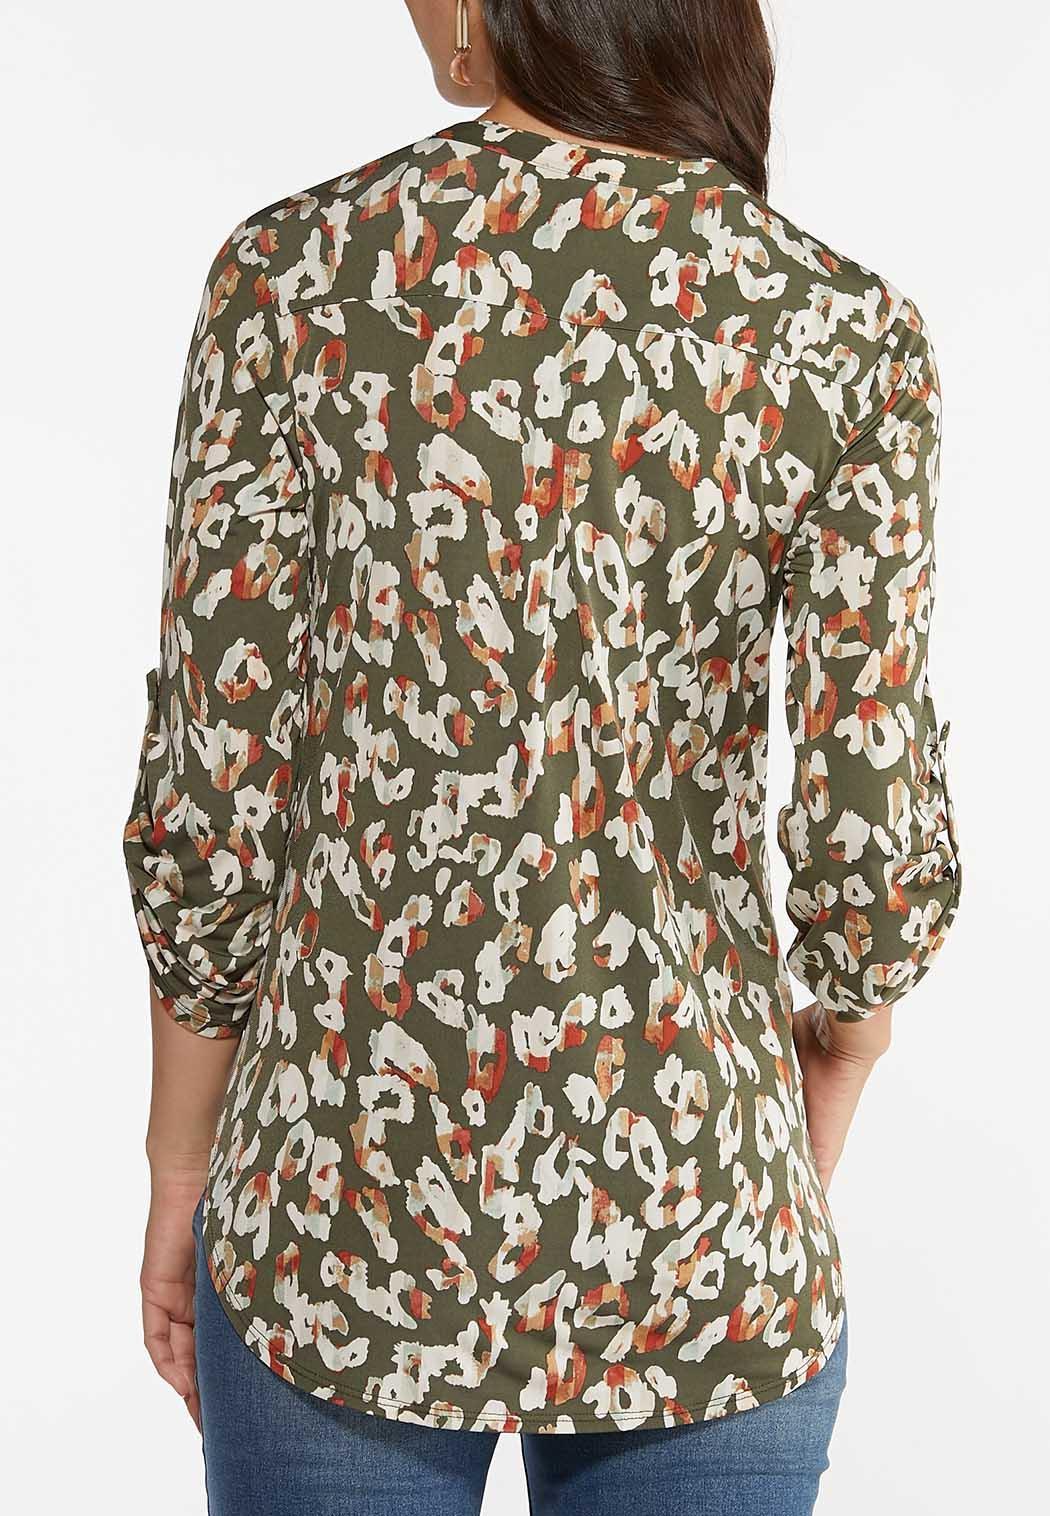 Olive Leopard Pullover Top (Item #44398150)